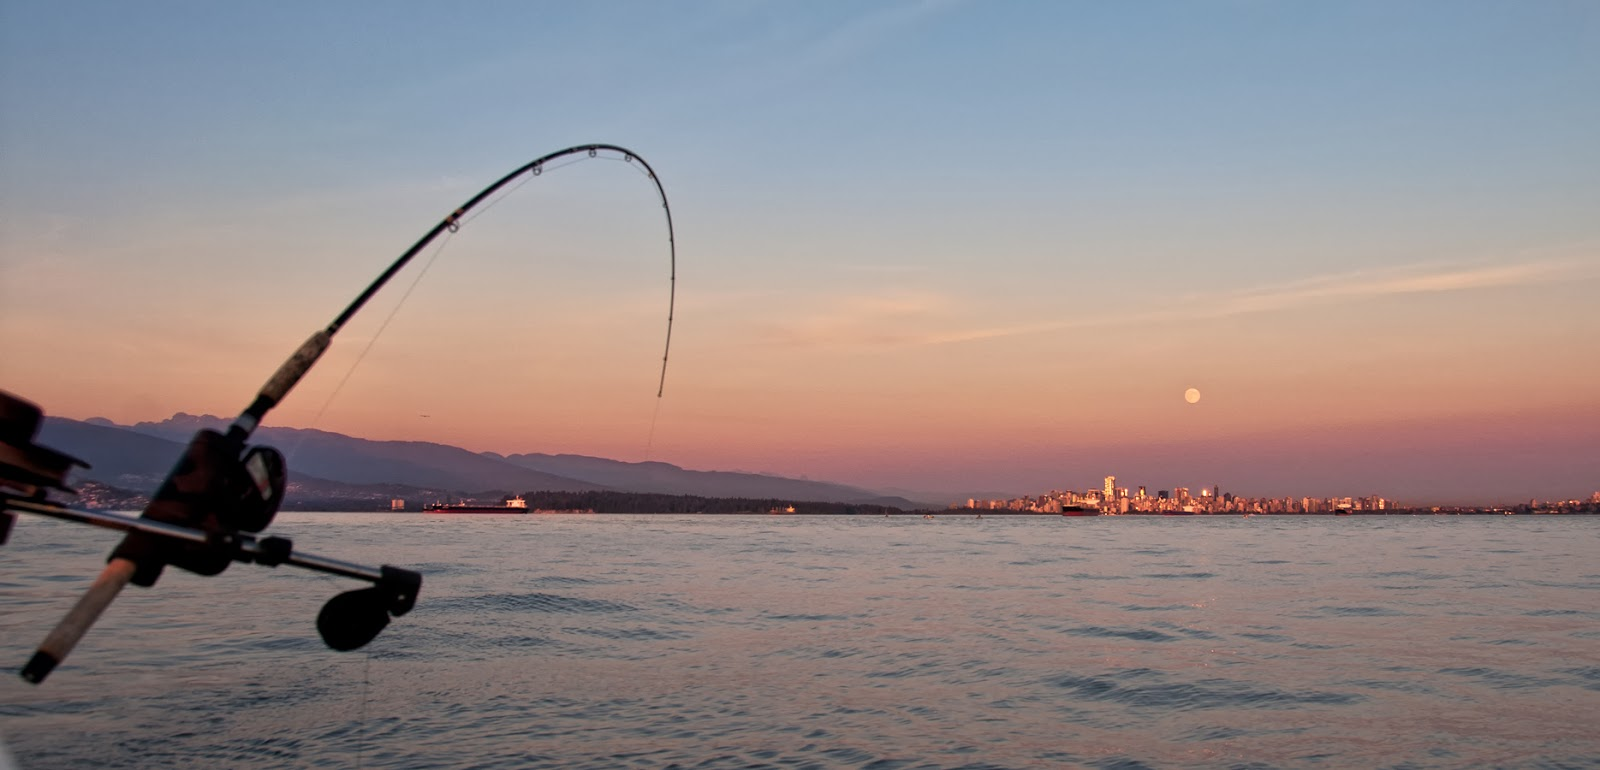 A Fishing Pole